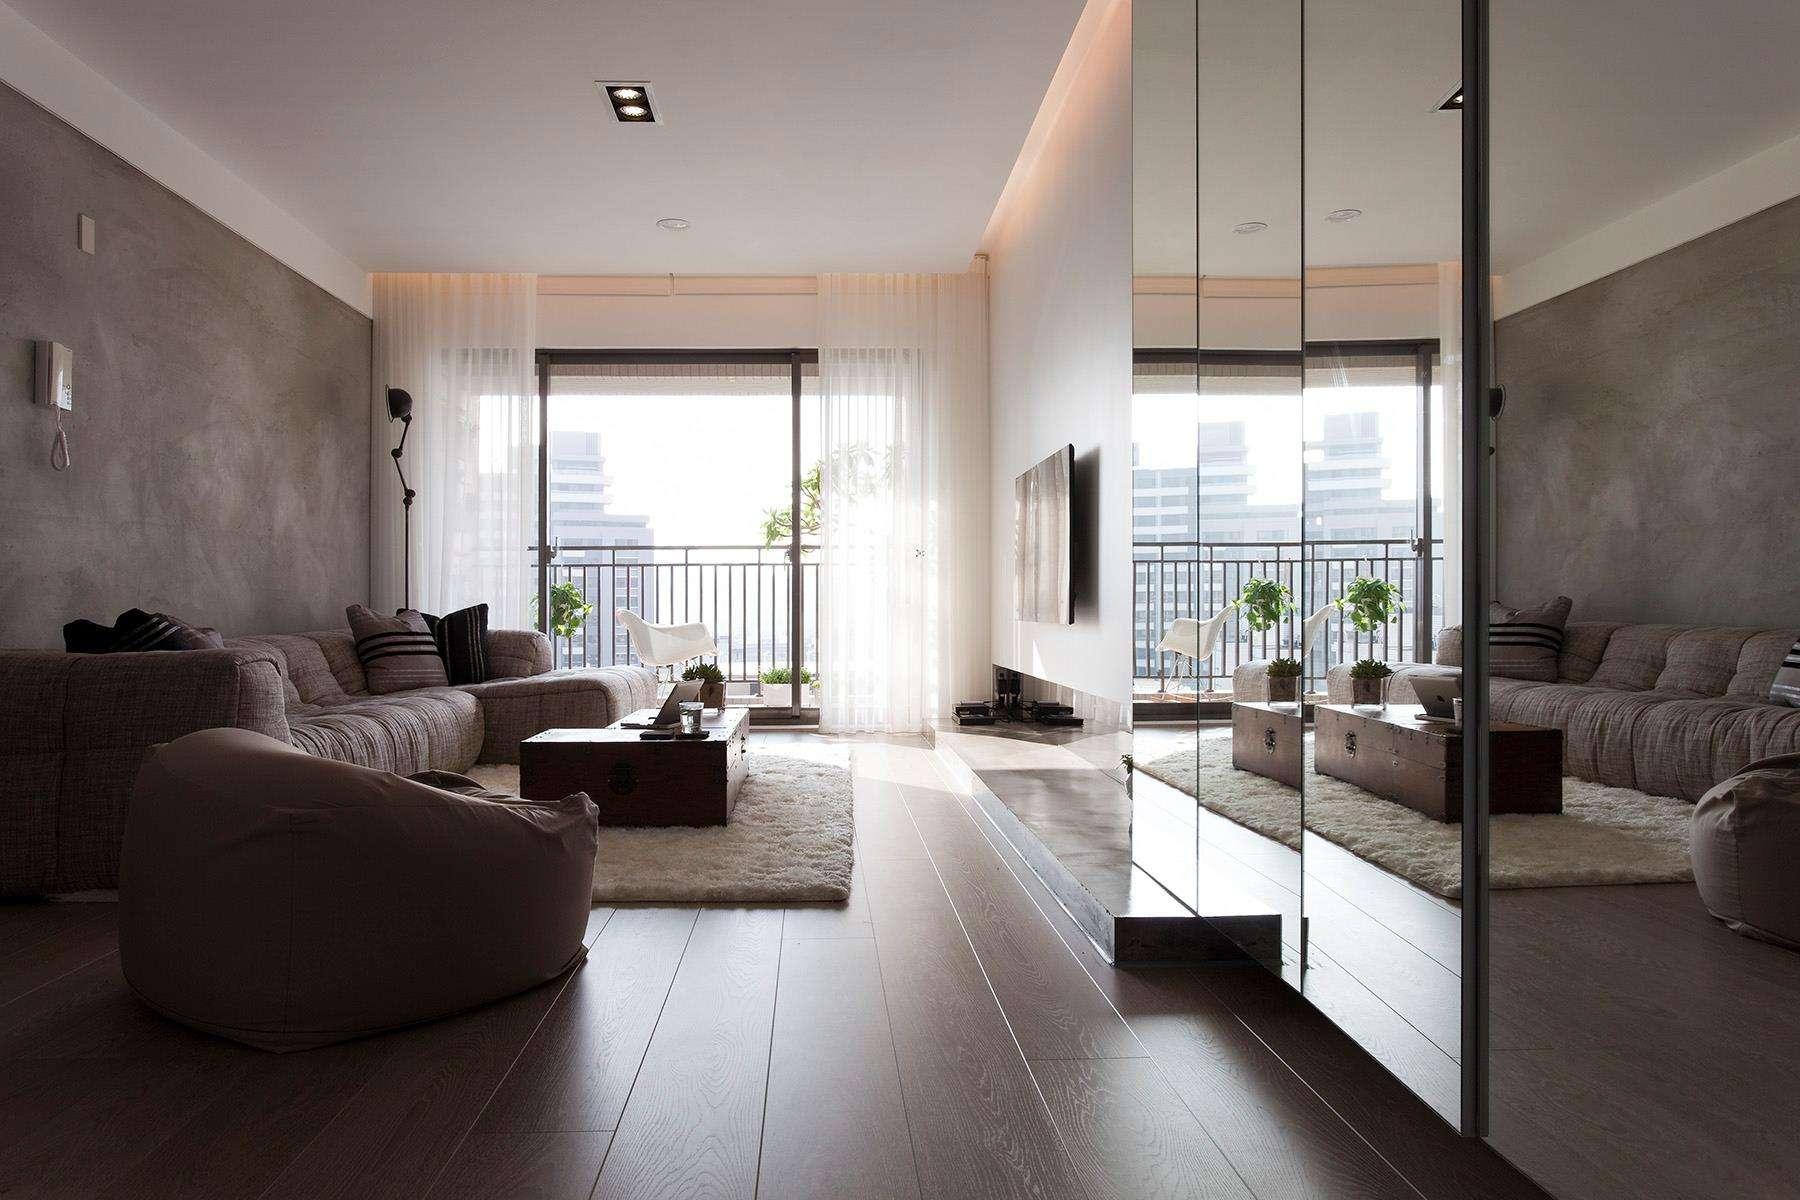 Однокомнатная квартира 40 кв м серый интерьер